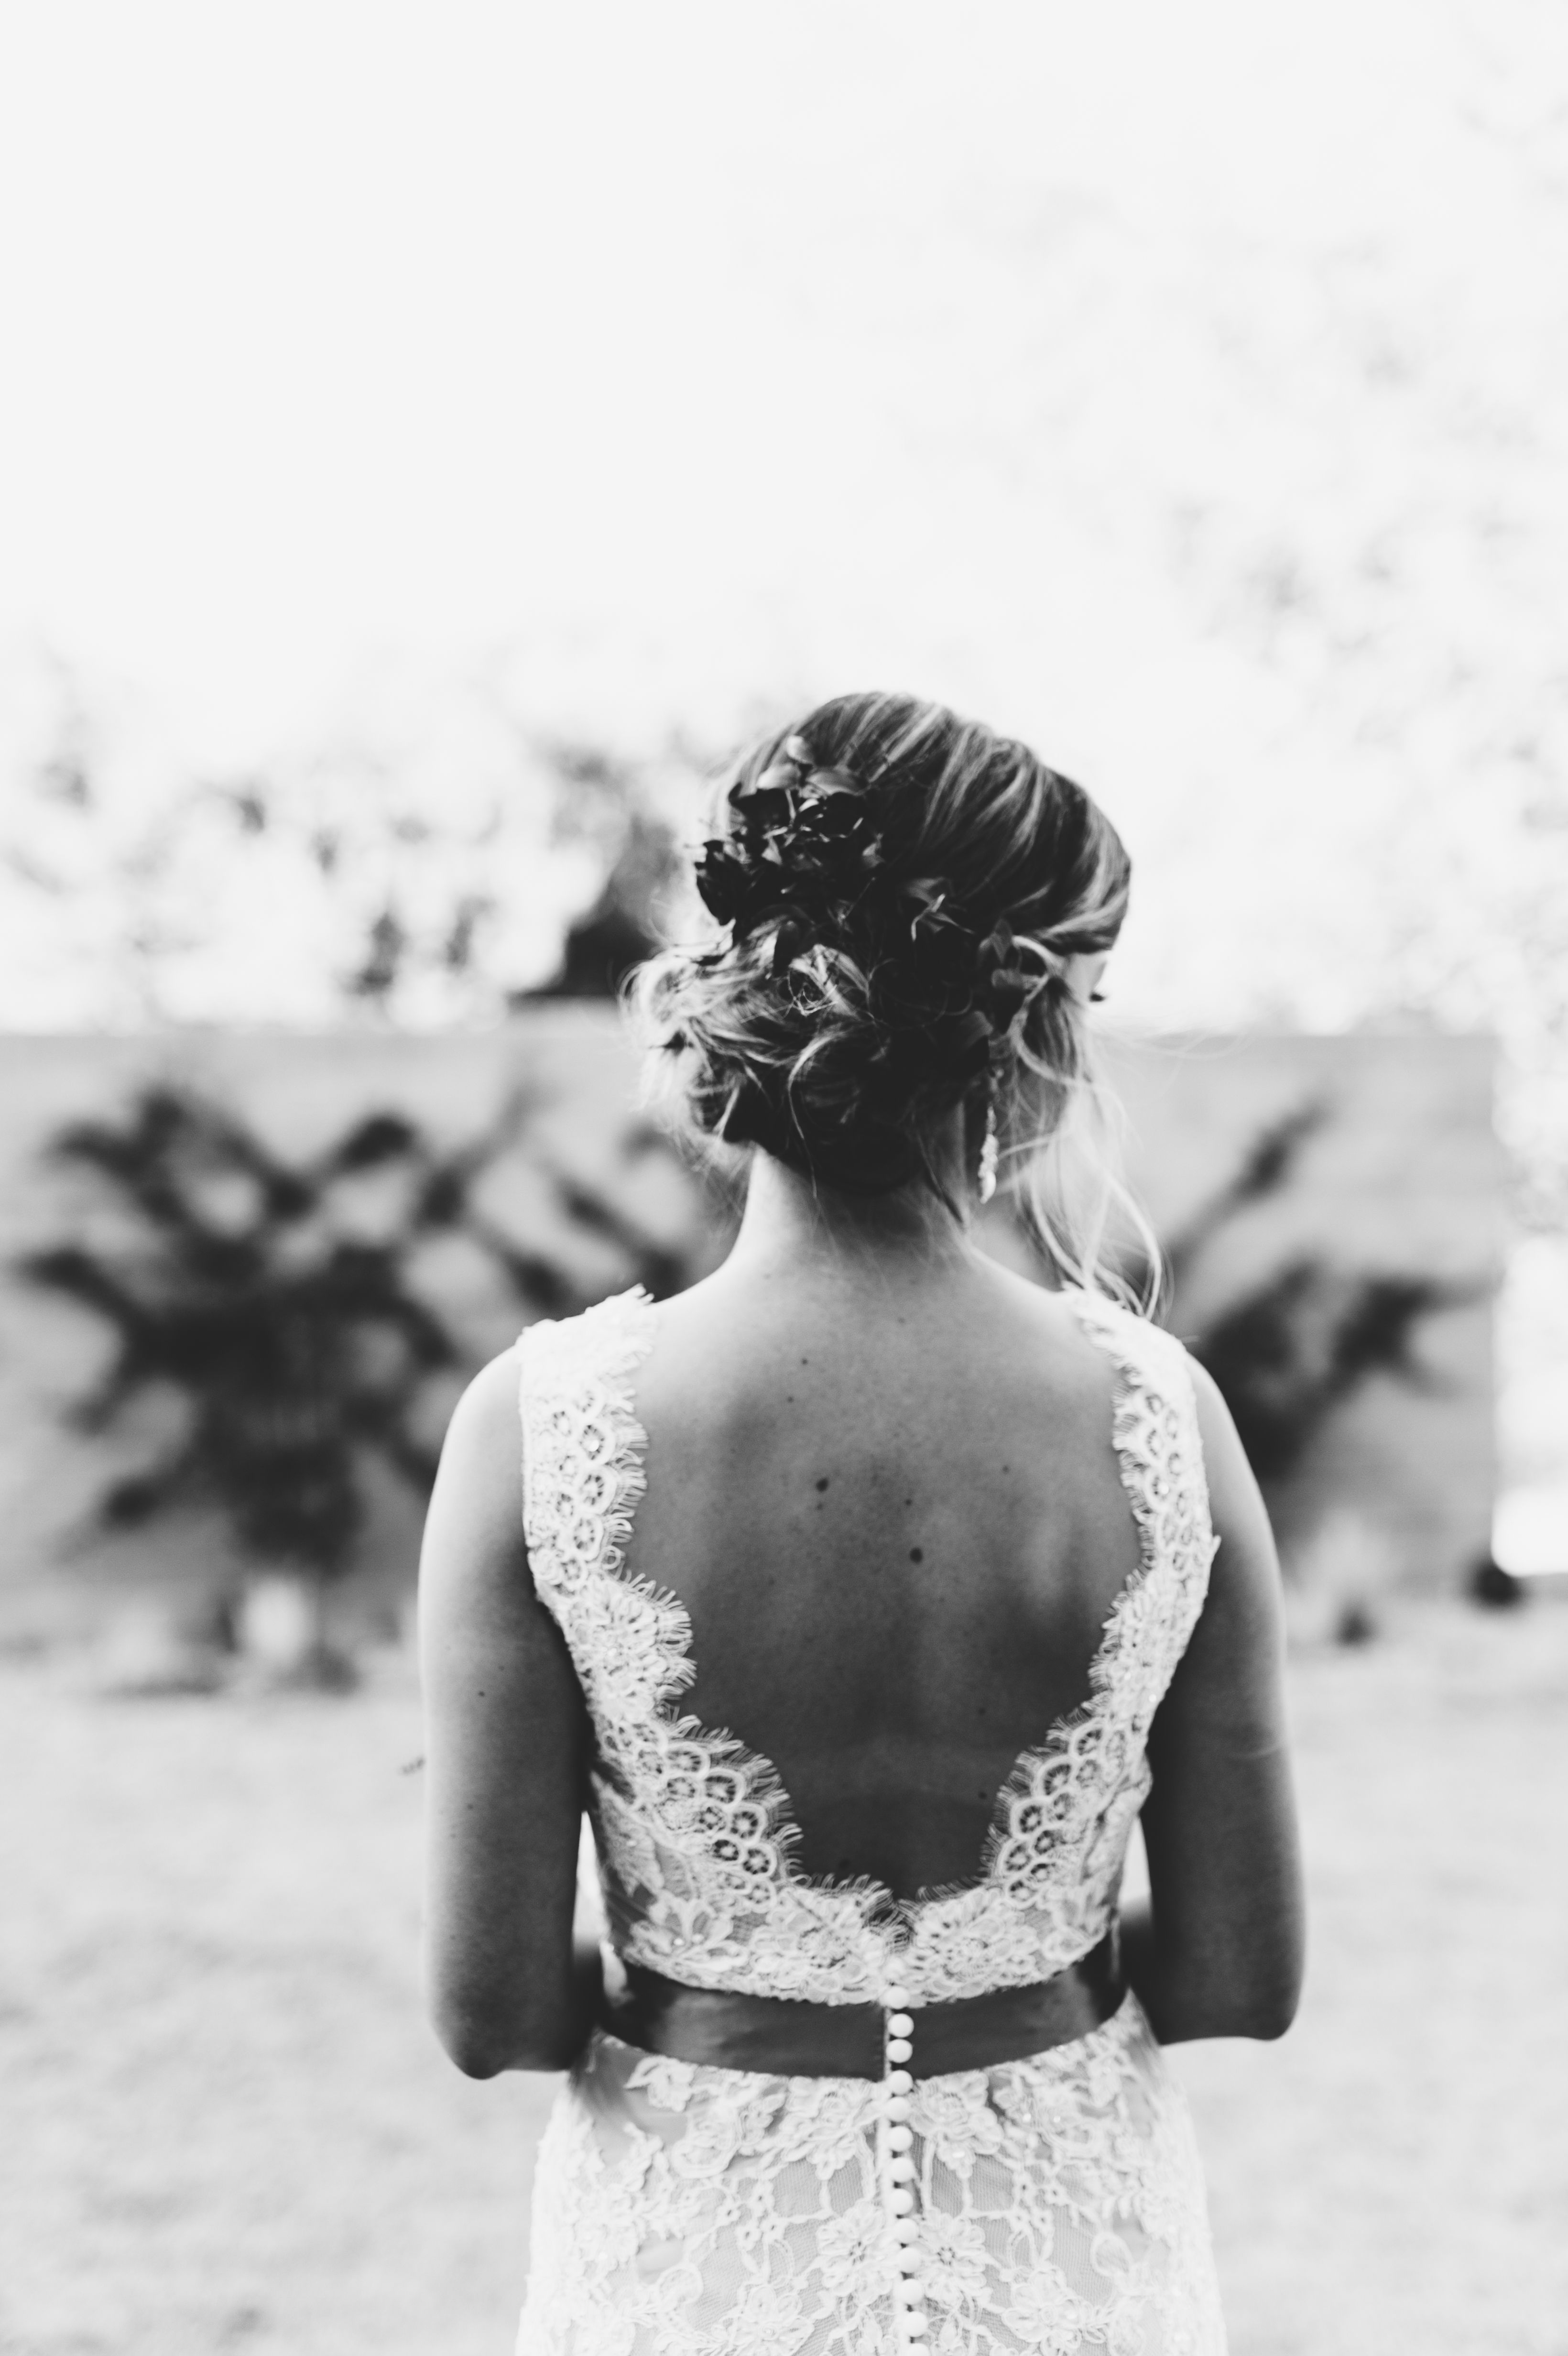 outdoor wedding venues in fort worth tx%0A BRIK Venue   Fort Worth   Texas   Industrial   Warehouse   Weddings   Wood  Floors